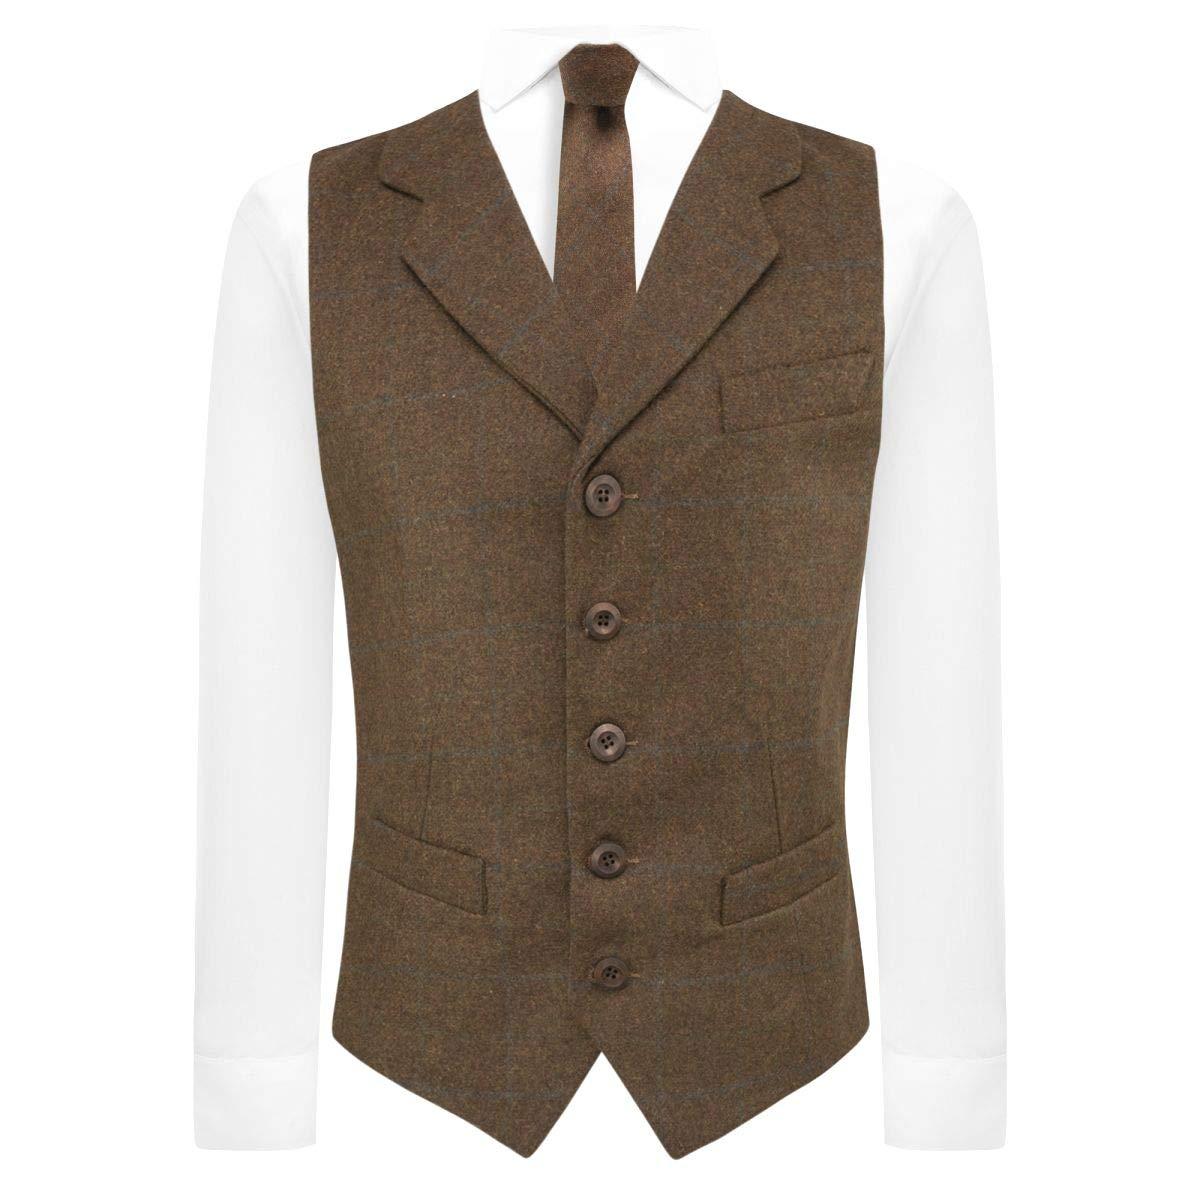 King /& Priory Cedar Brown Heritage Check Waistcoat with Lapel Tweed